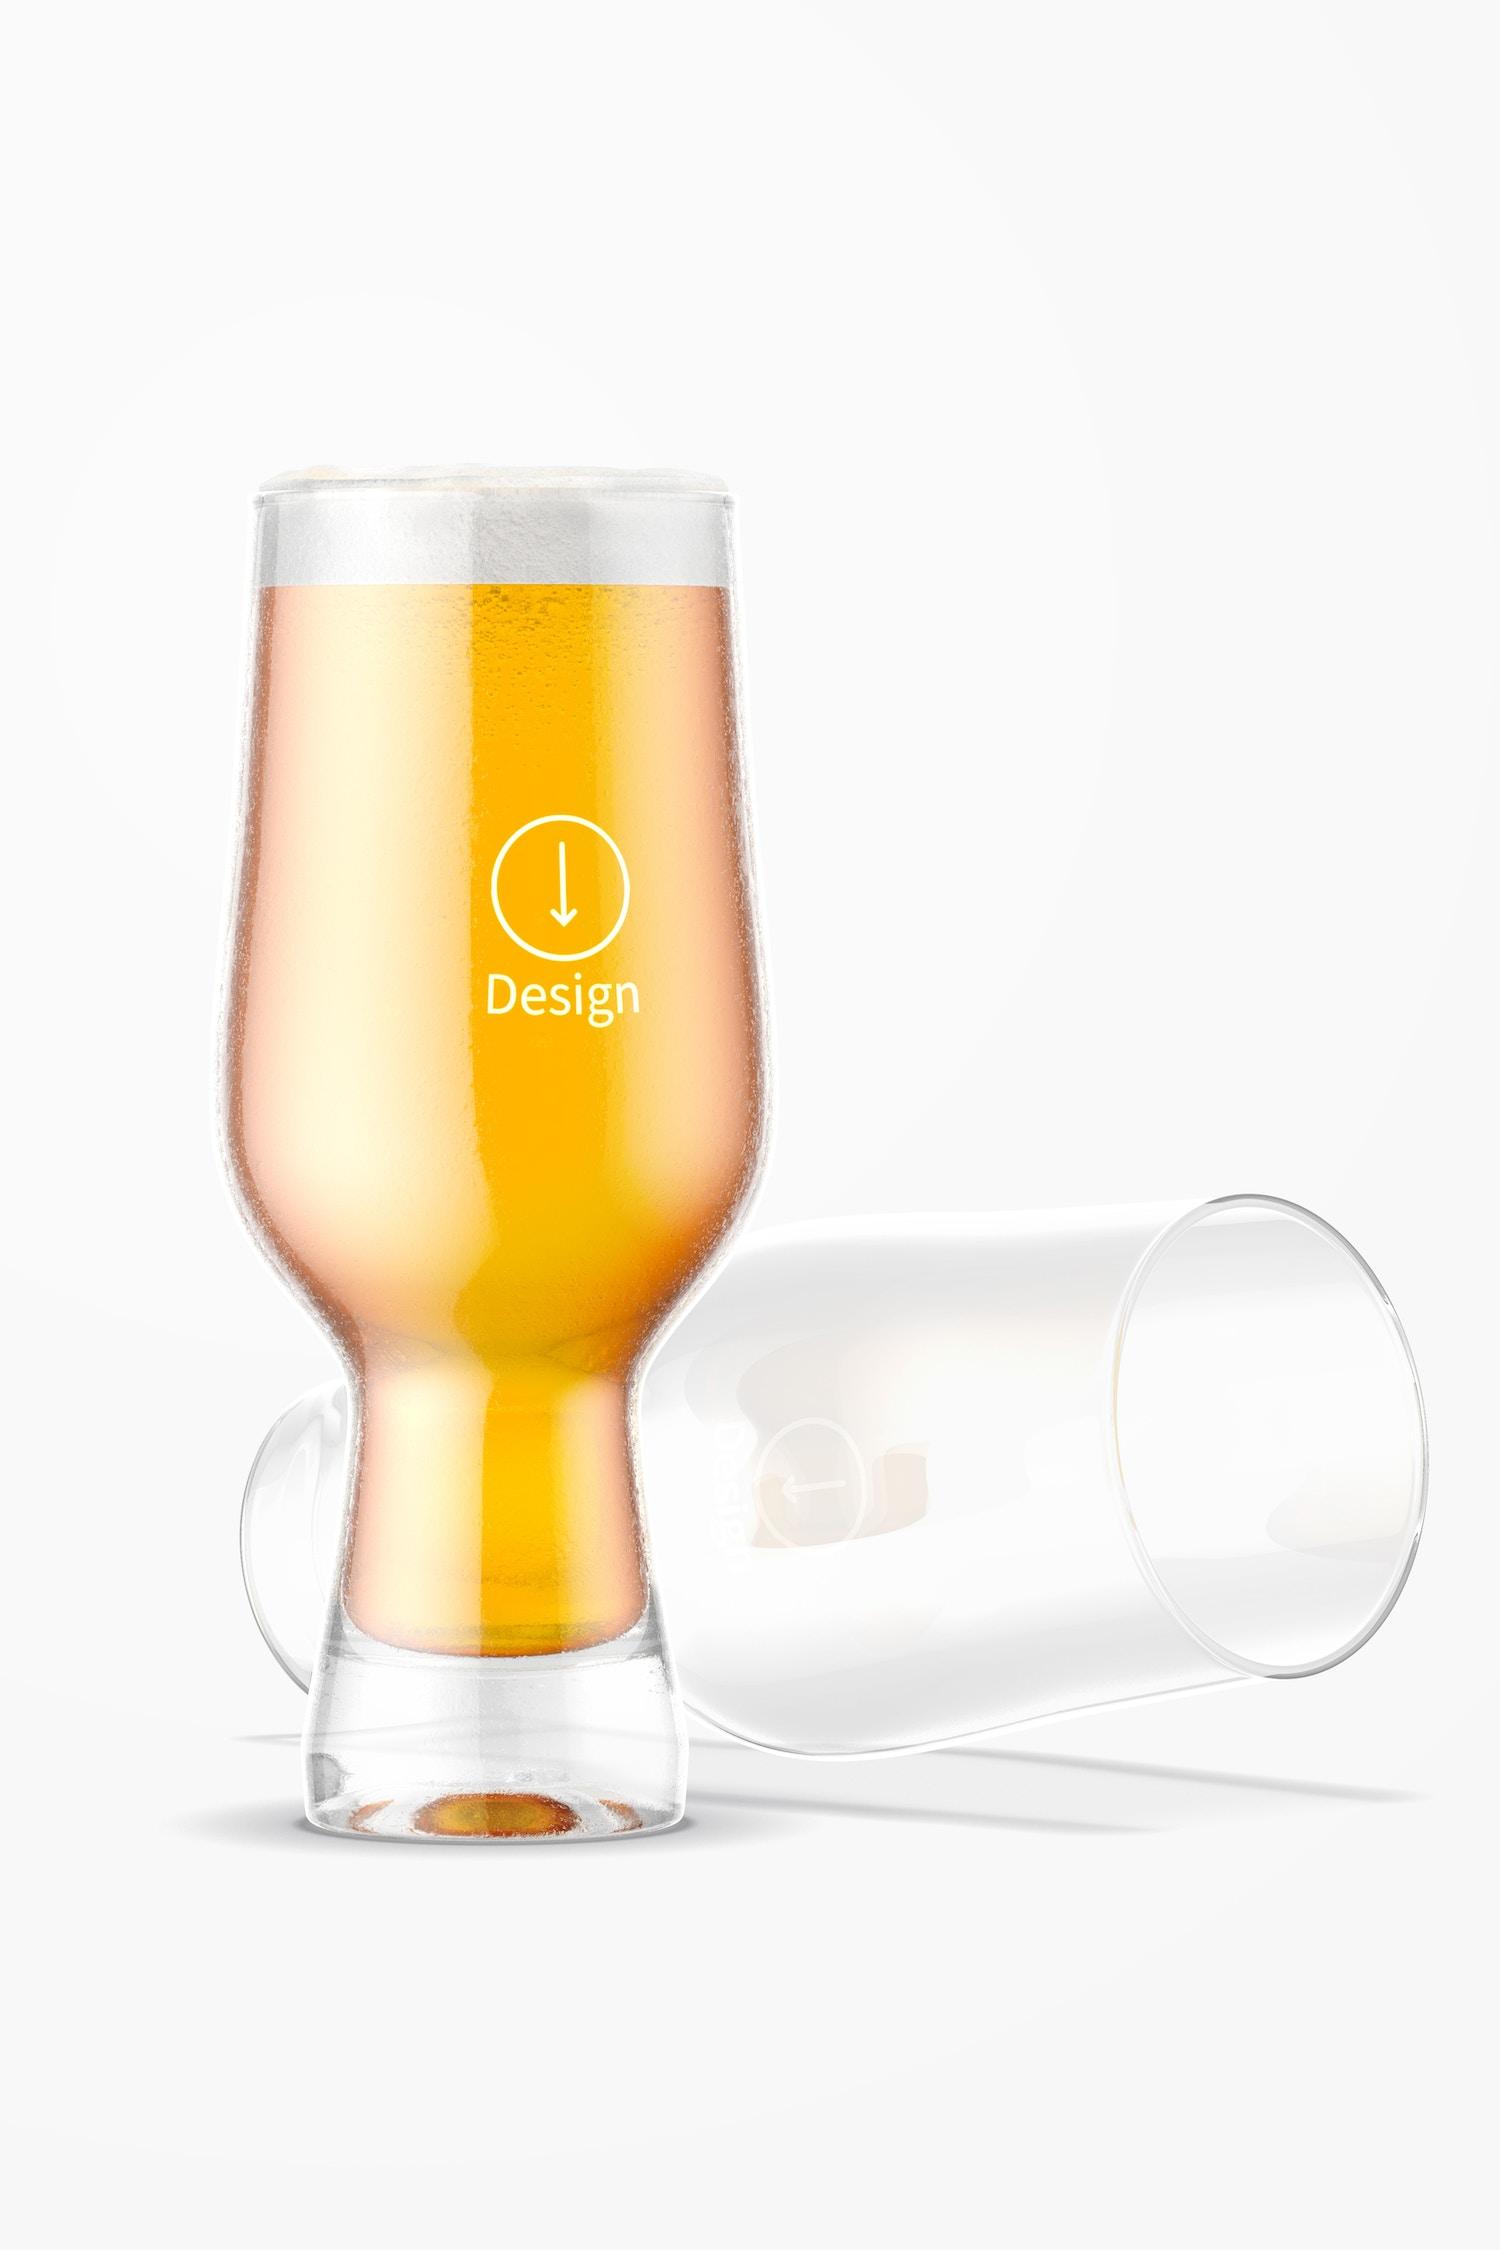 18 oz Glass Beer Cups Mockup